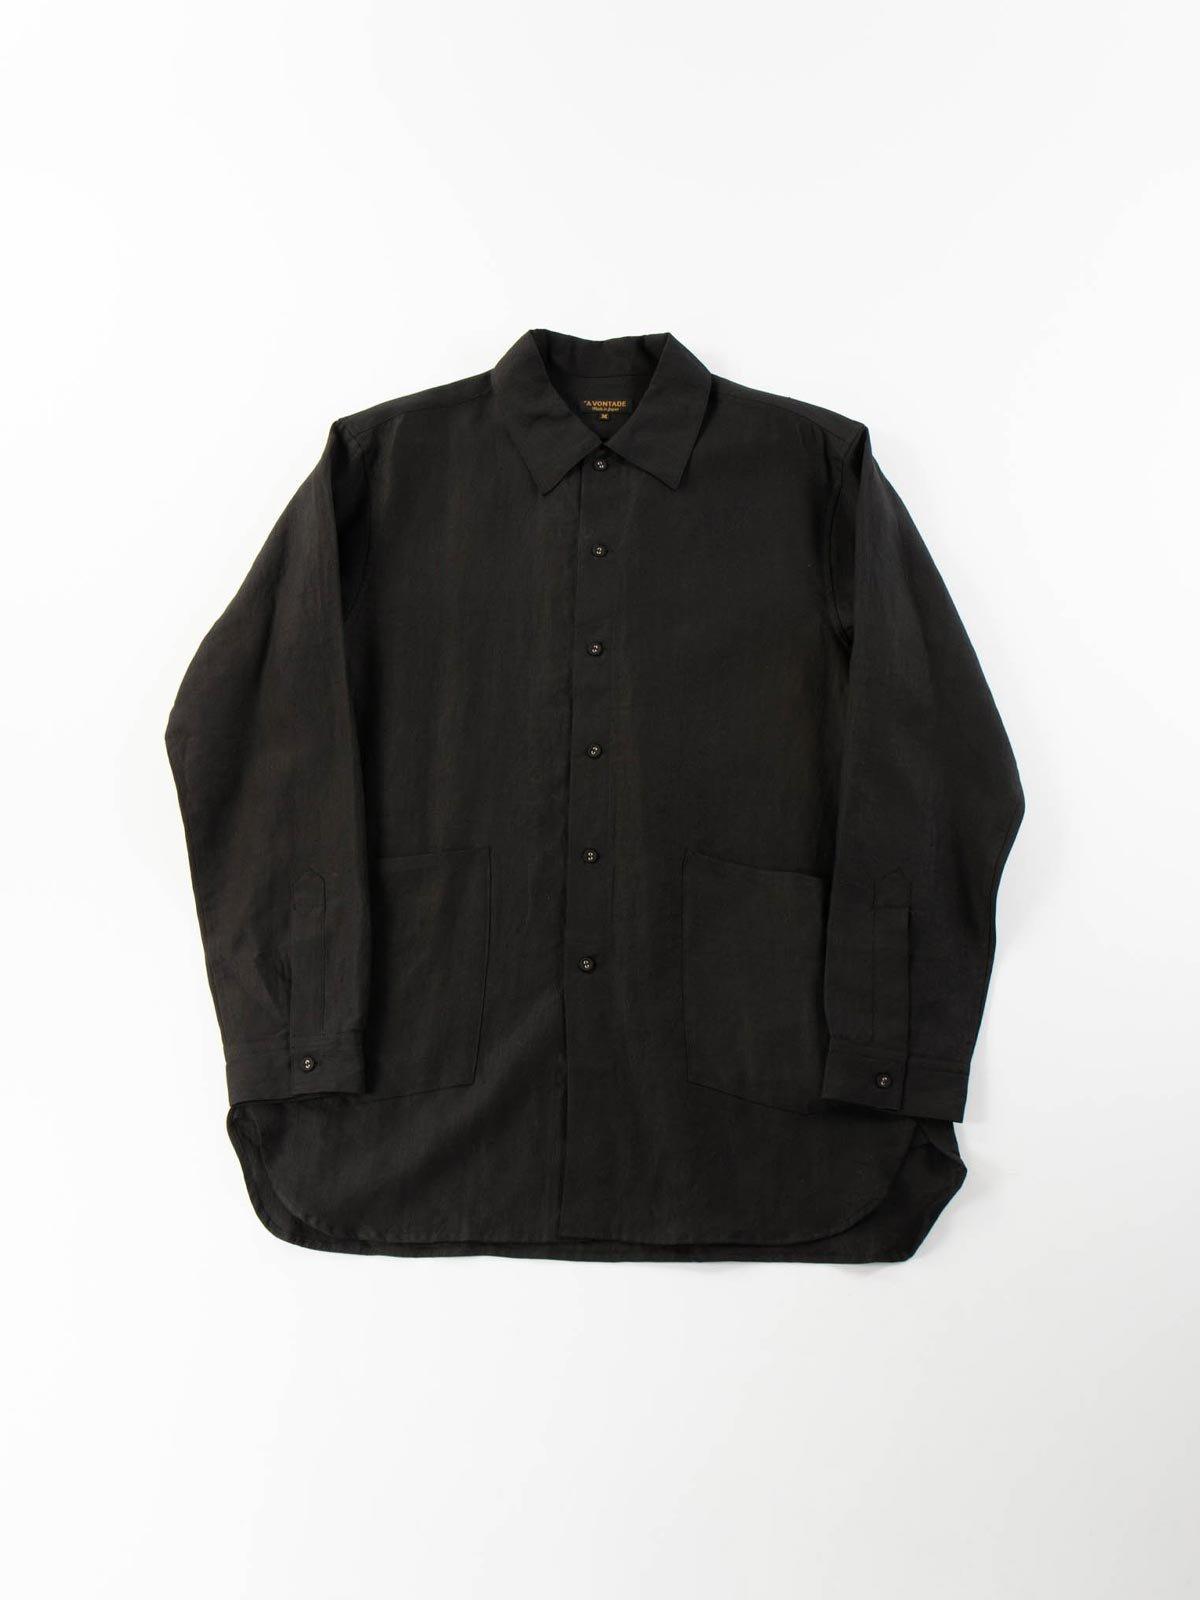 LINEN GARDNER SHIRT BLACK - Image 1